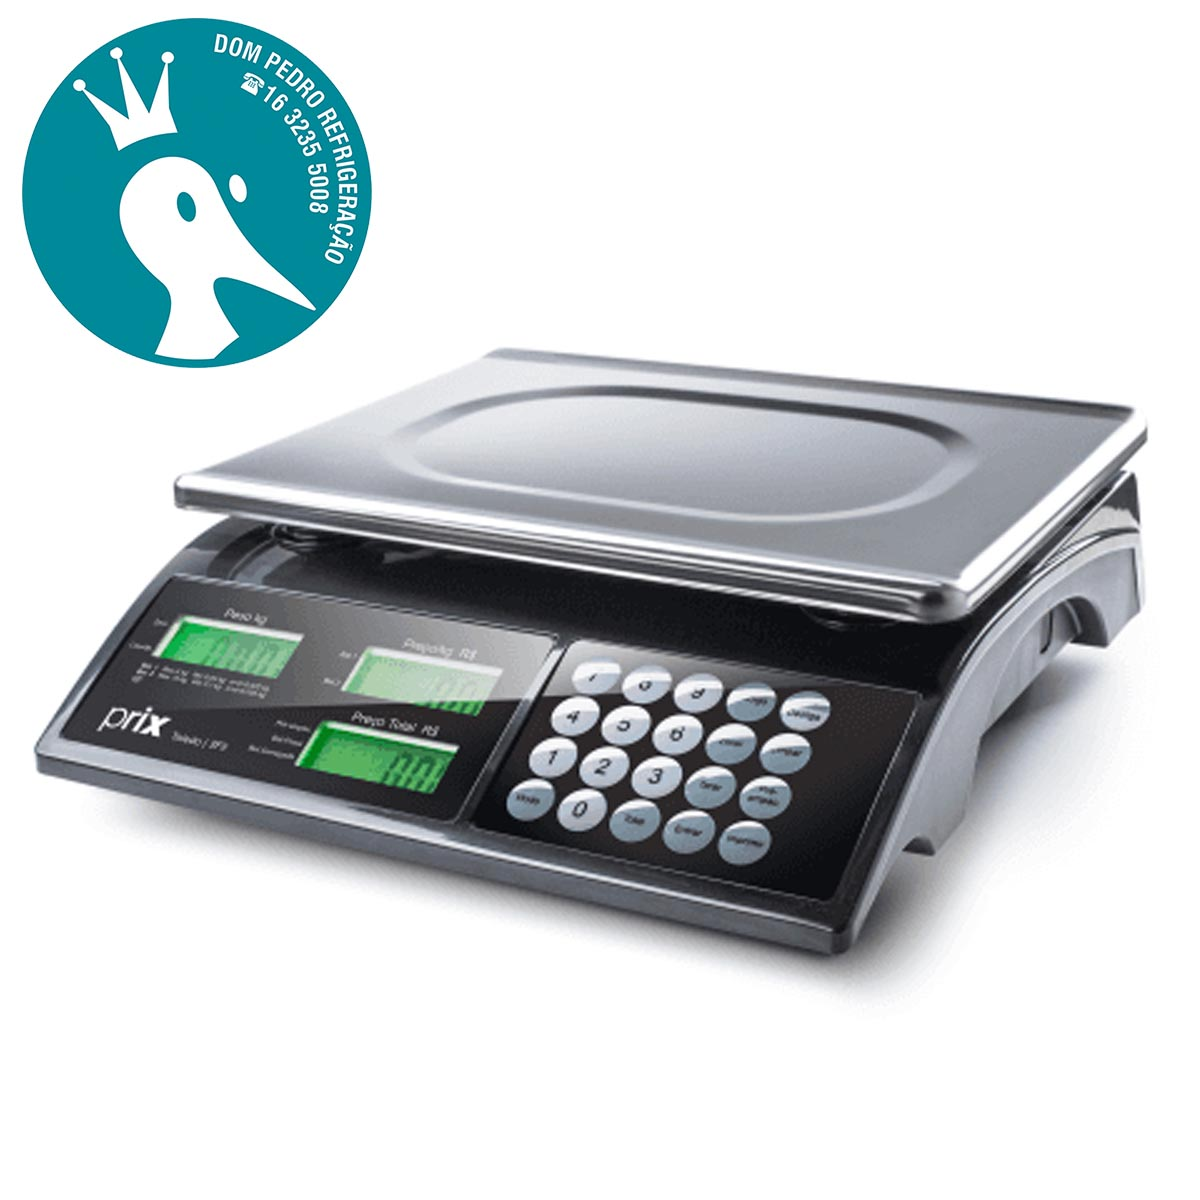 Balança Eletrônica Digital Computadora - Prix3 Fit - Bateria - Toledo